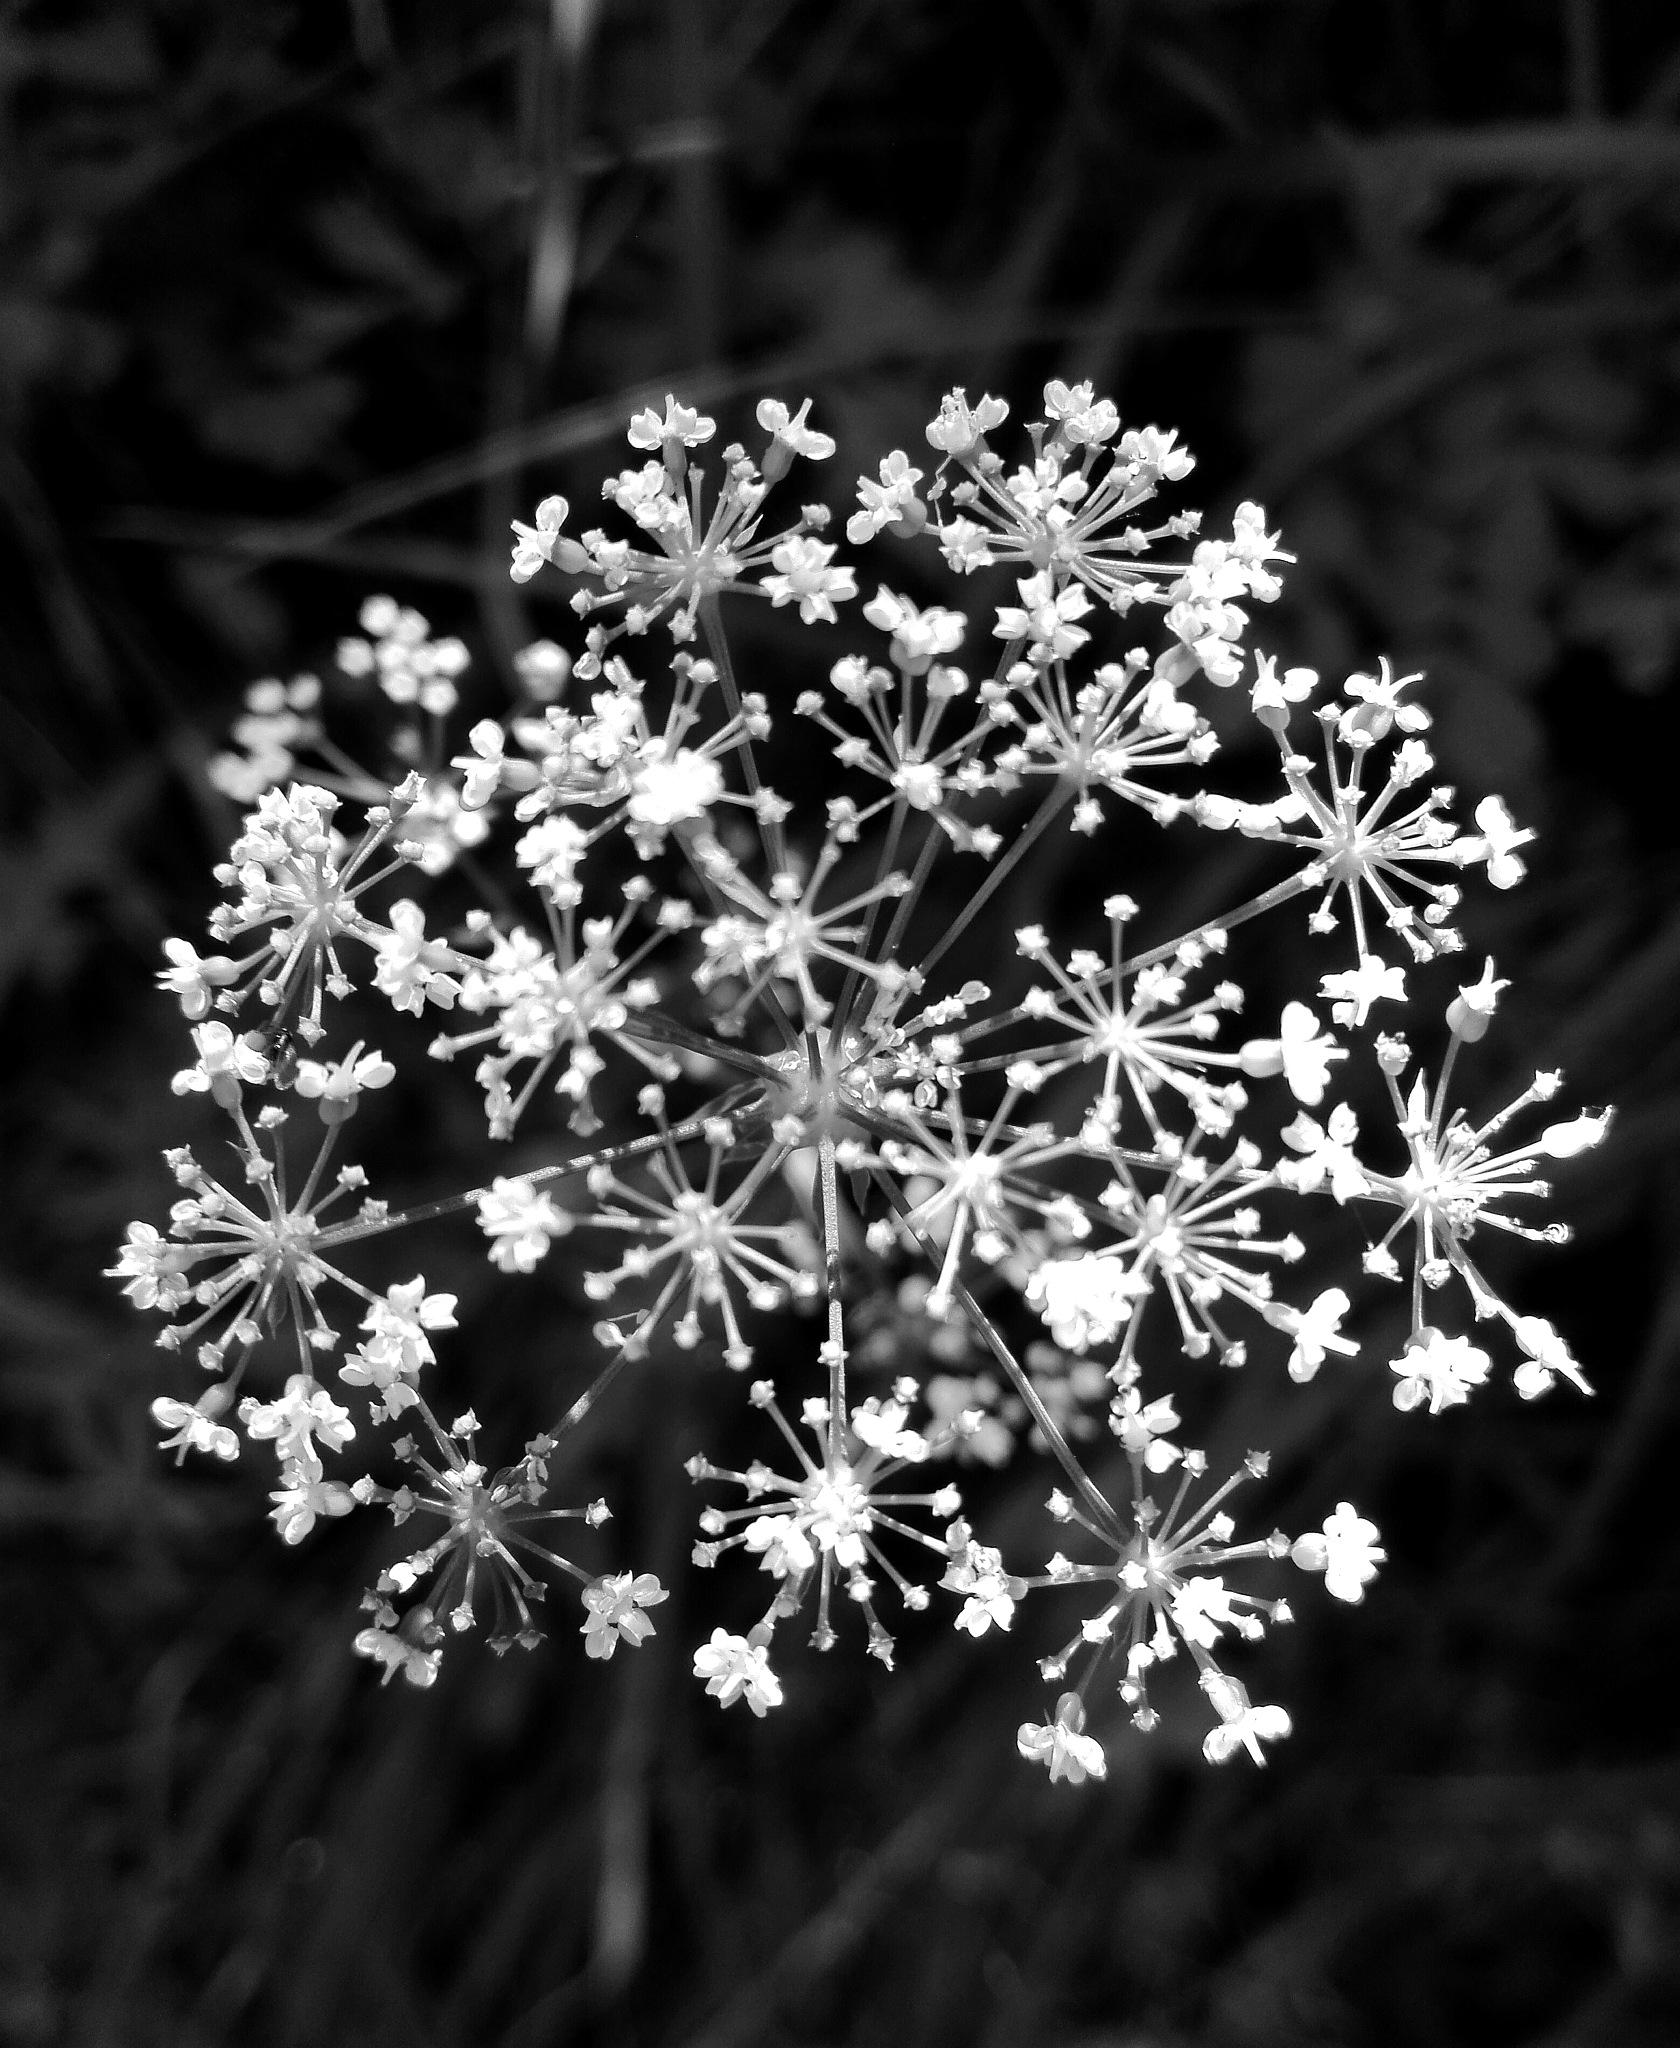 fire works or flower by  Gaelle Le Meur